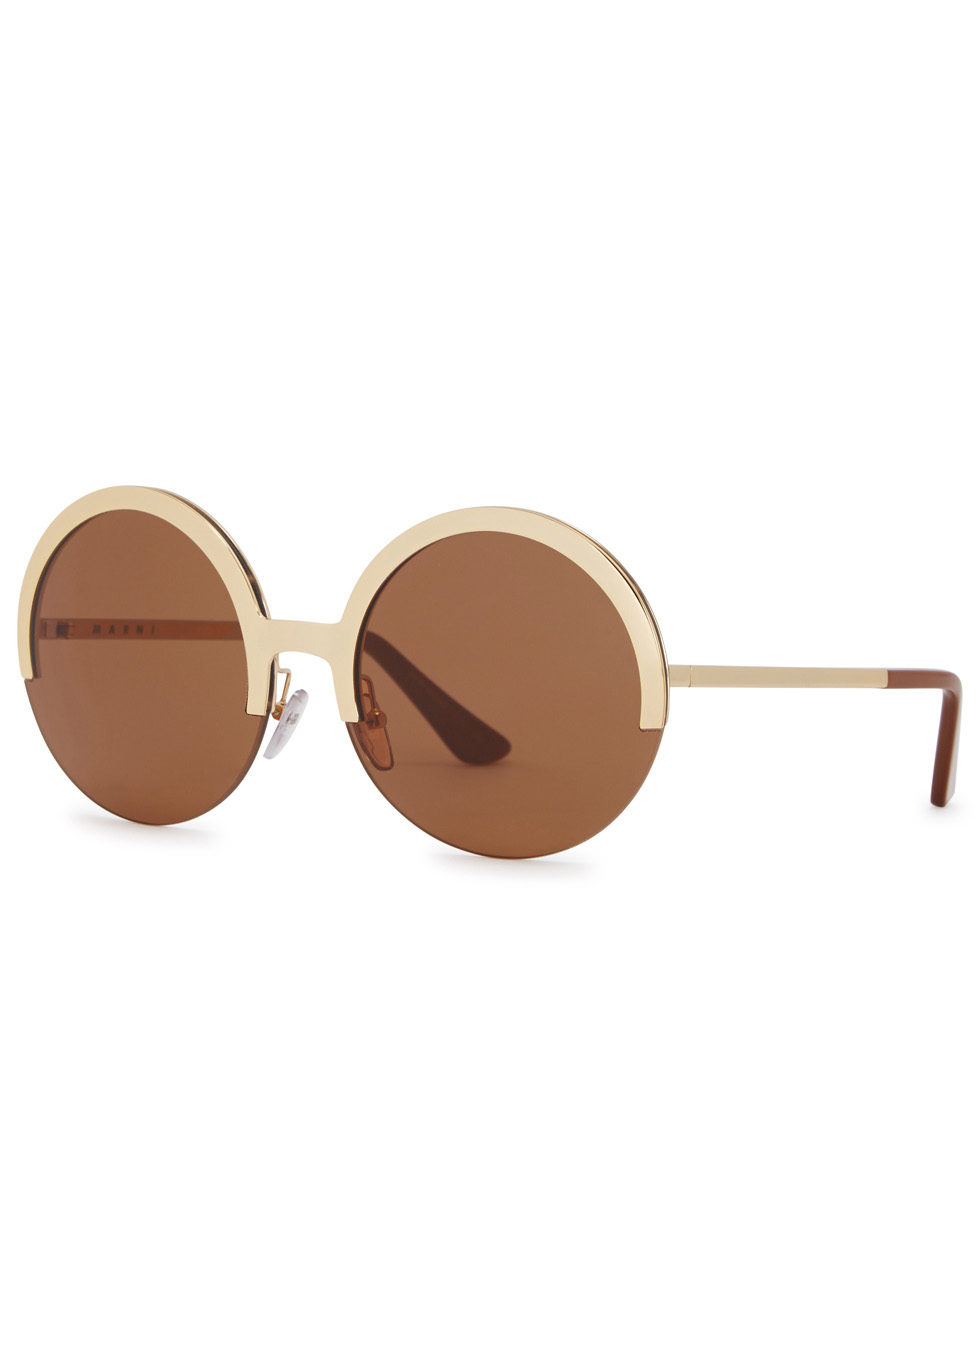 39158406de Women s Designer Sunglasses and Eyewear - Harvey Nichols